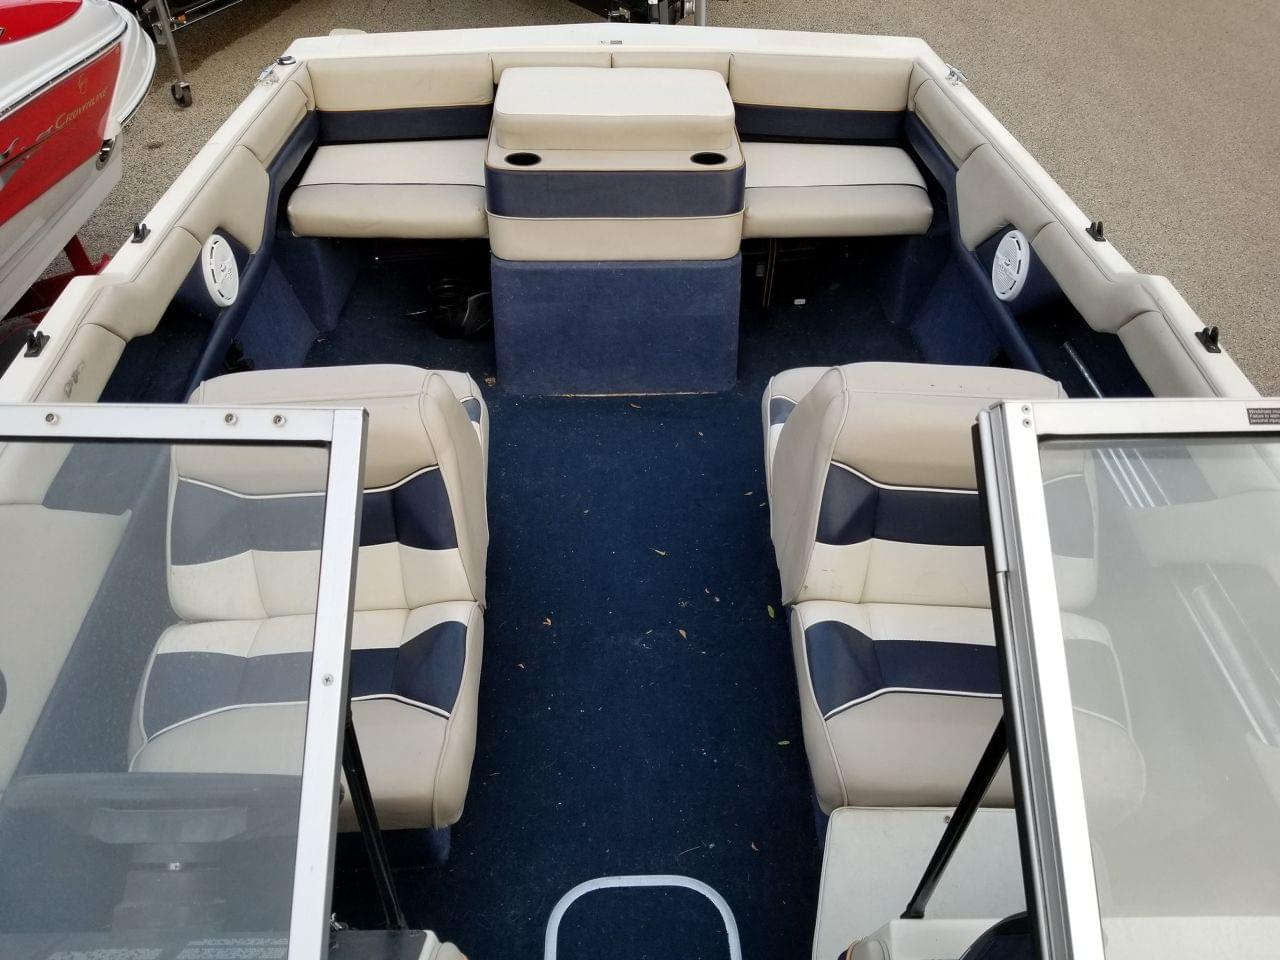 Used 1996 Bayliner 1954 Capri, Stock #UBJ3118 - B - The Boat